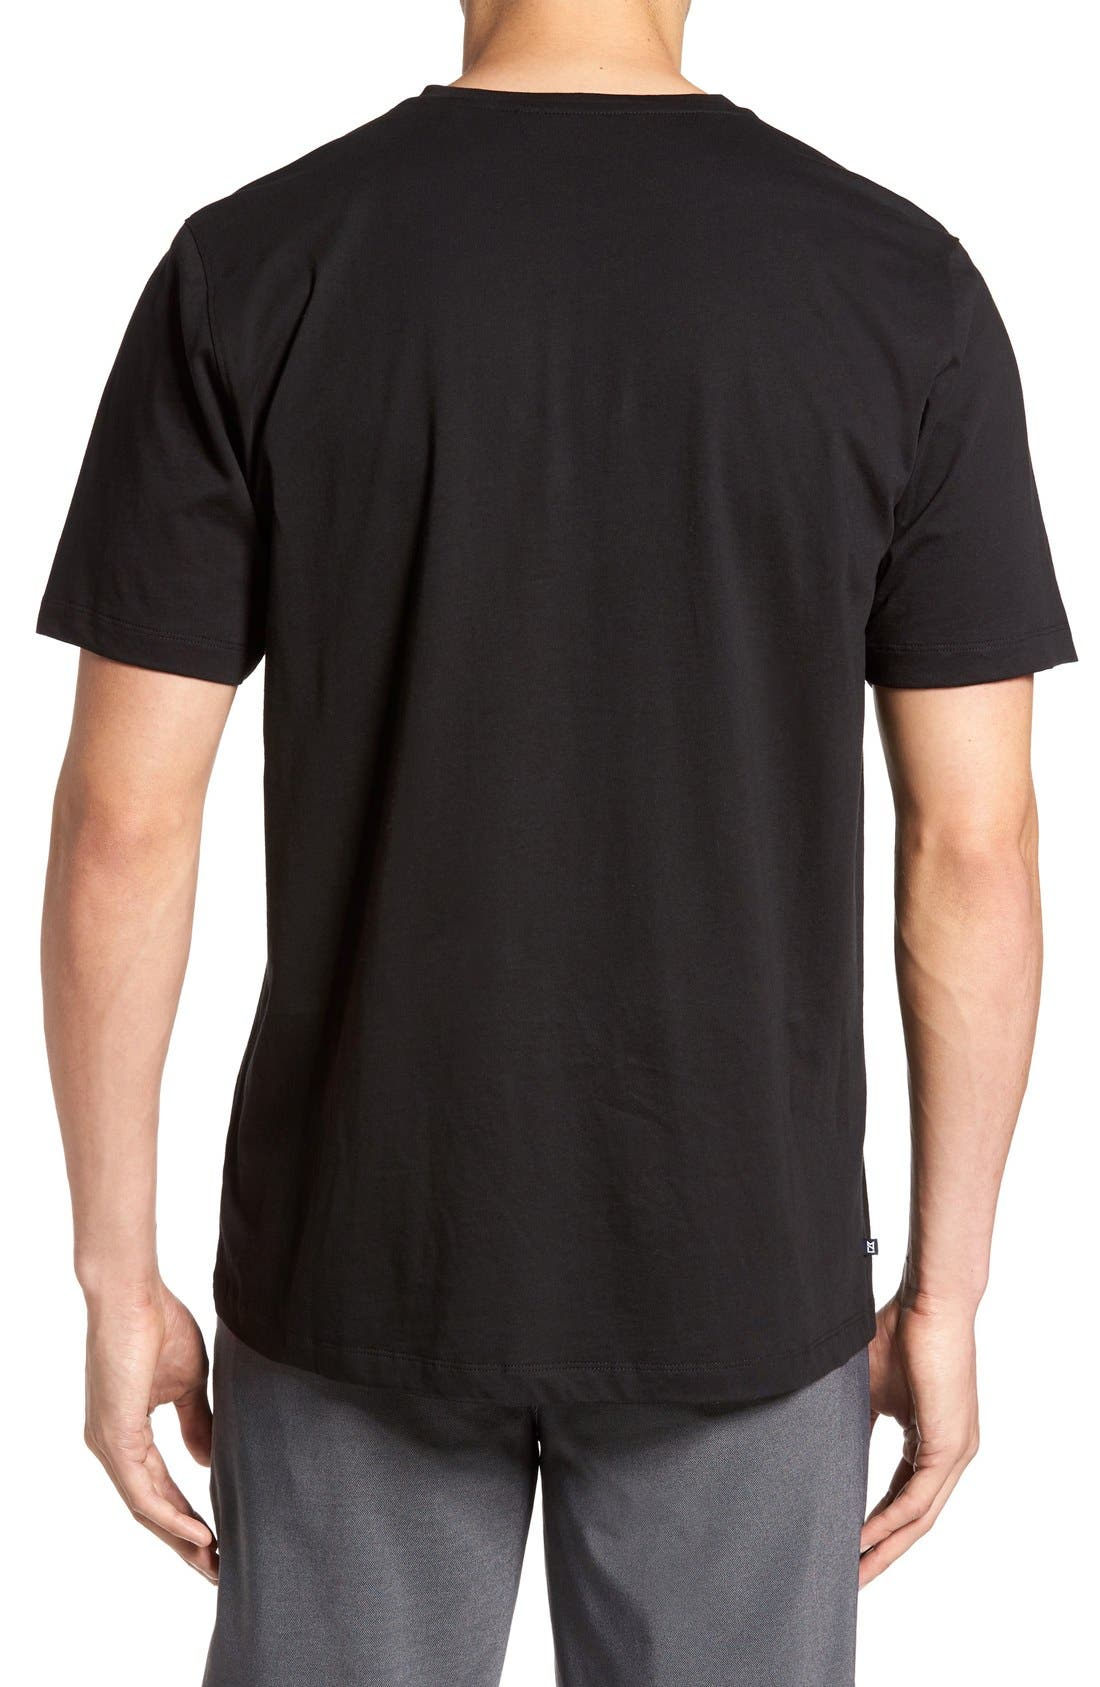 Alternate Image 2  - Cutter & Buck 'Sida' V-Neck T-Shirt (Big & Tall)